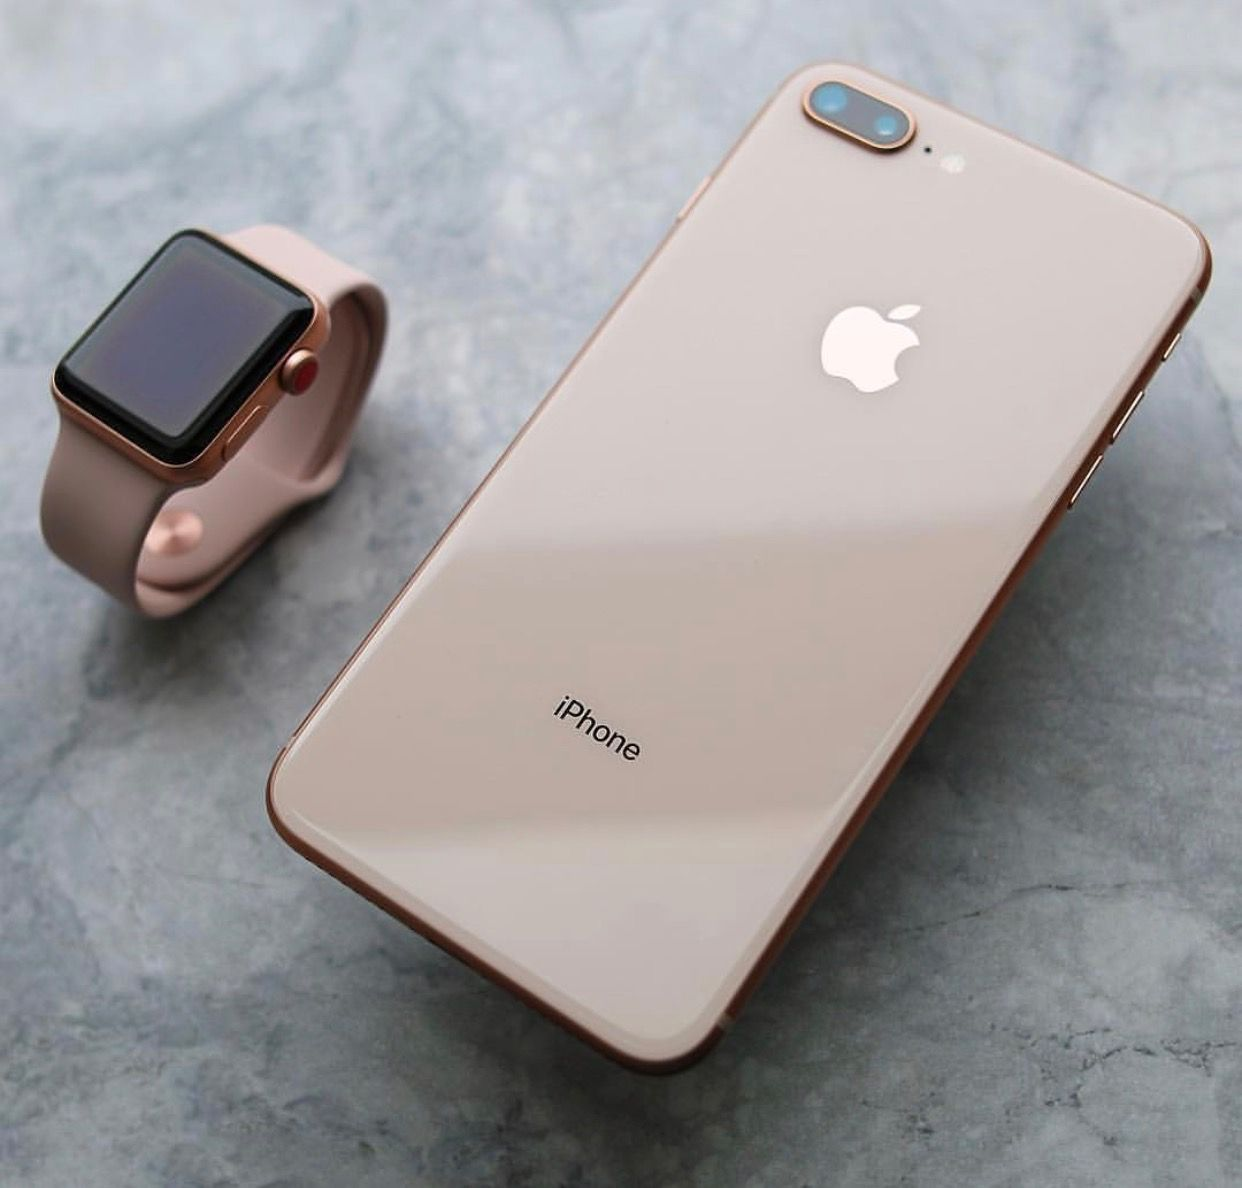 Pin De Vine Mart Electronics Em Phone Style Acessorios Iphone Macbook Dourado Iphone 8